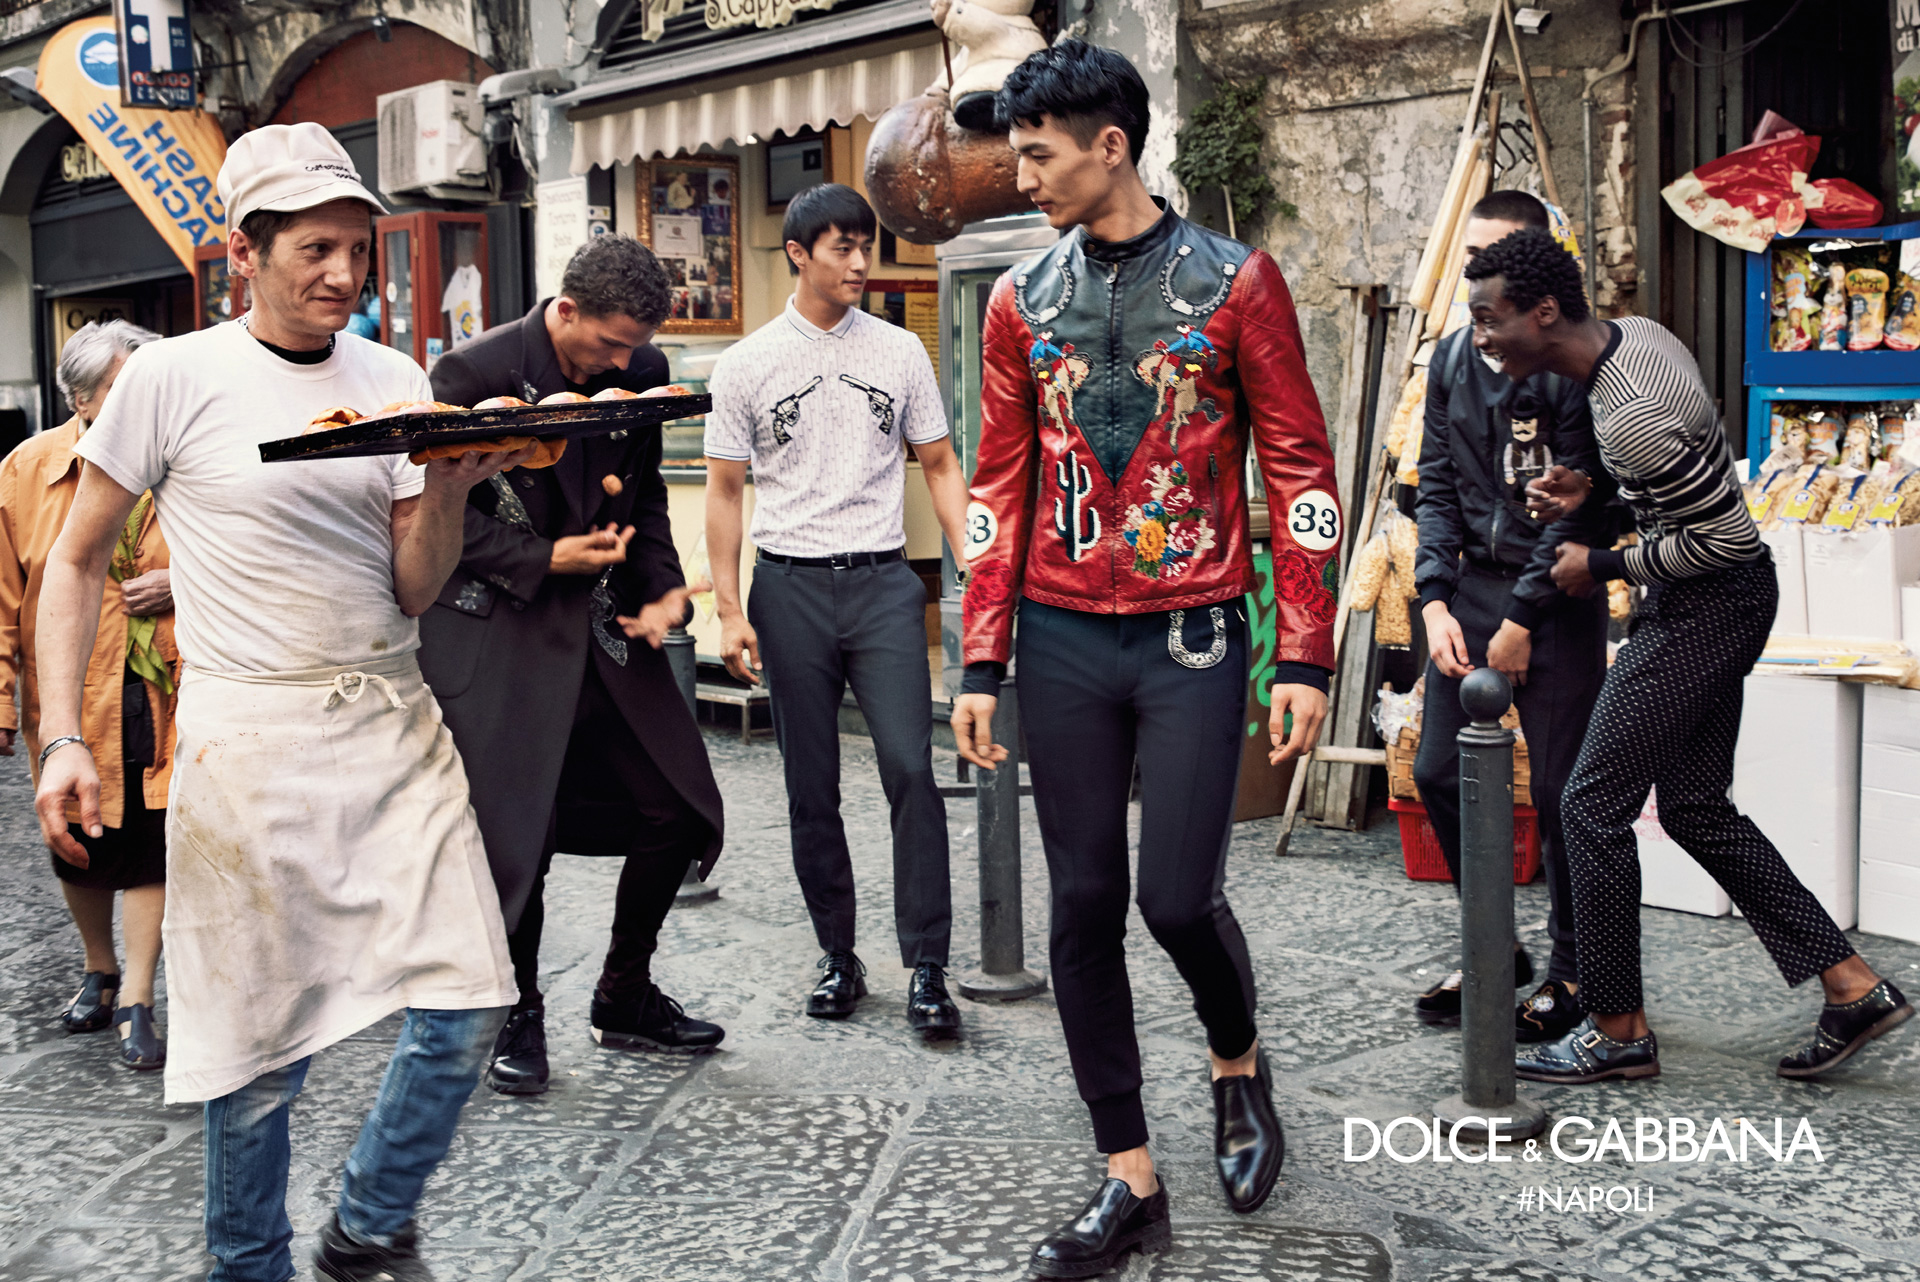 Dolce-Gabbana-Fall-Winter-2016-2017-Ad-Campaign-Naples-8